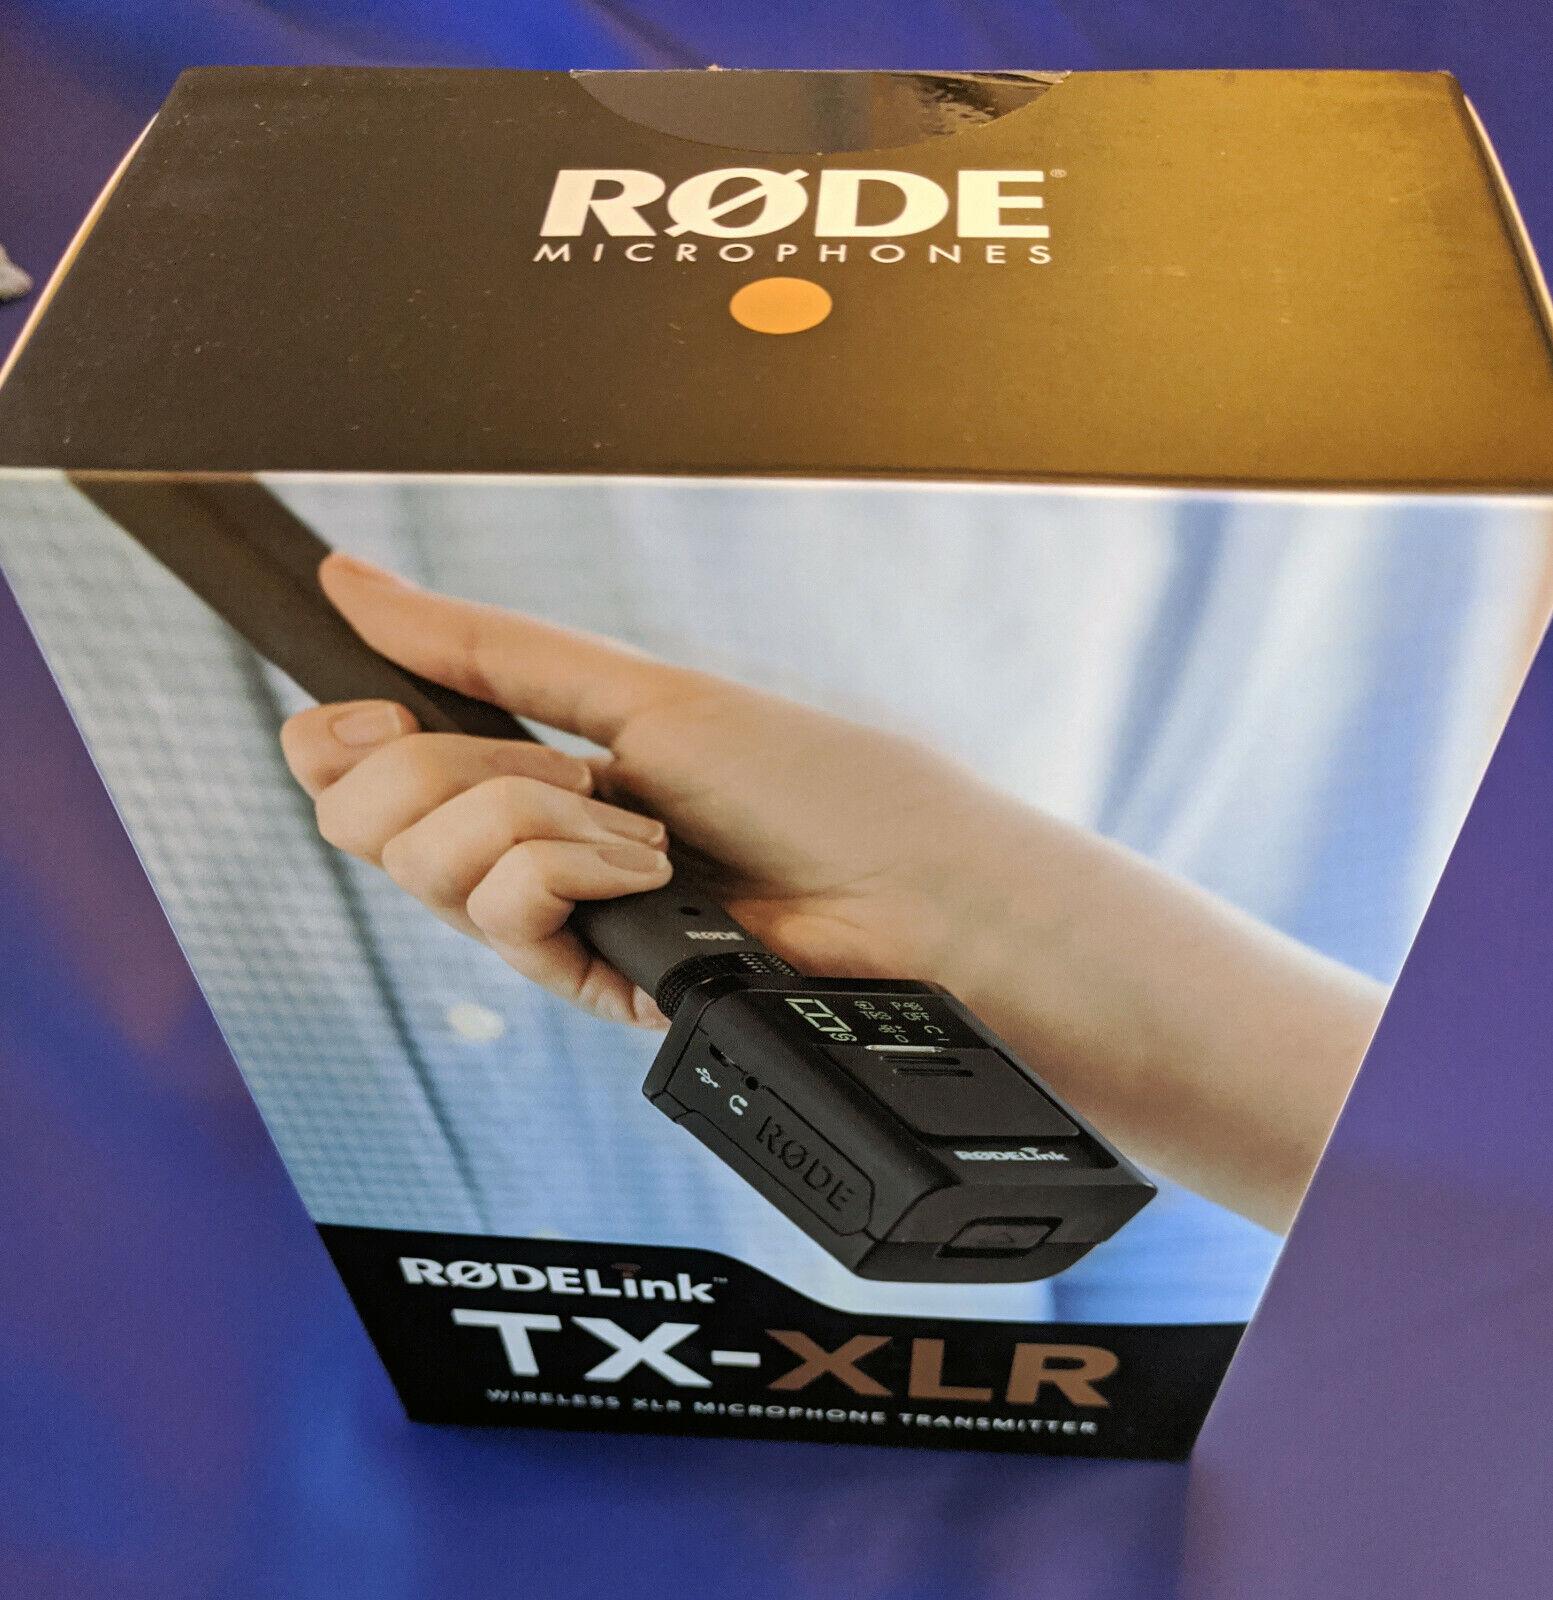 Rode Microphones TX-XLR XLR Wireless Transmitter for RODElink Wireless System